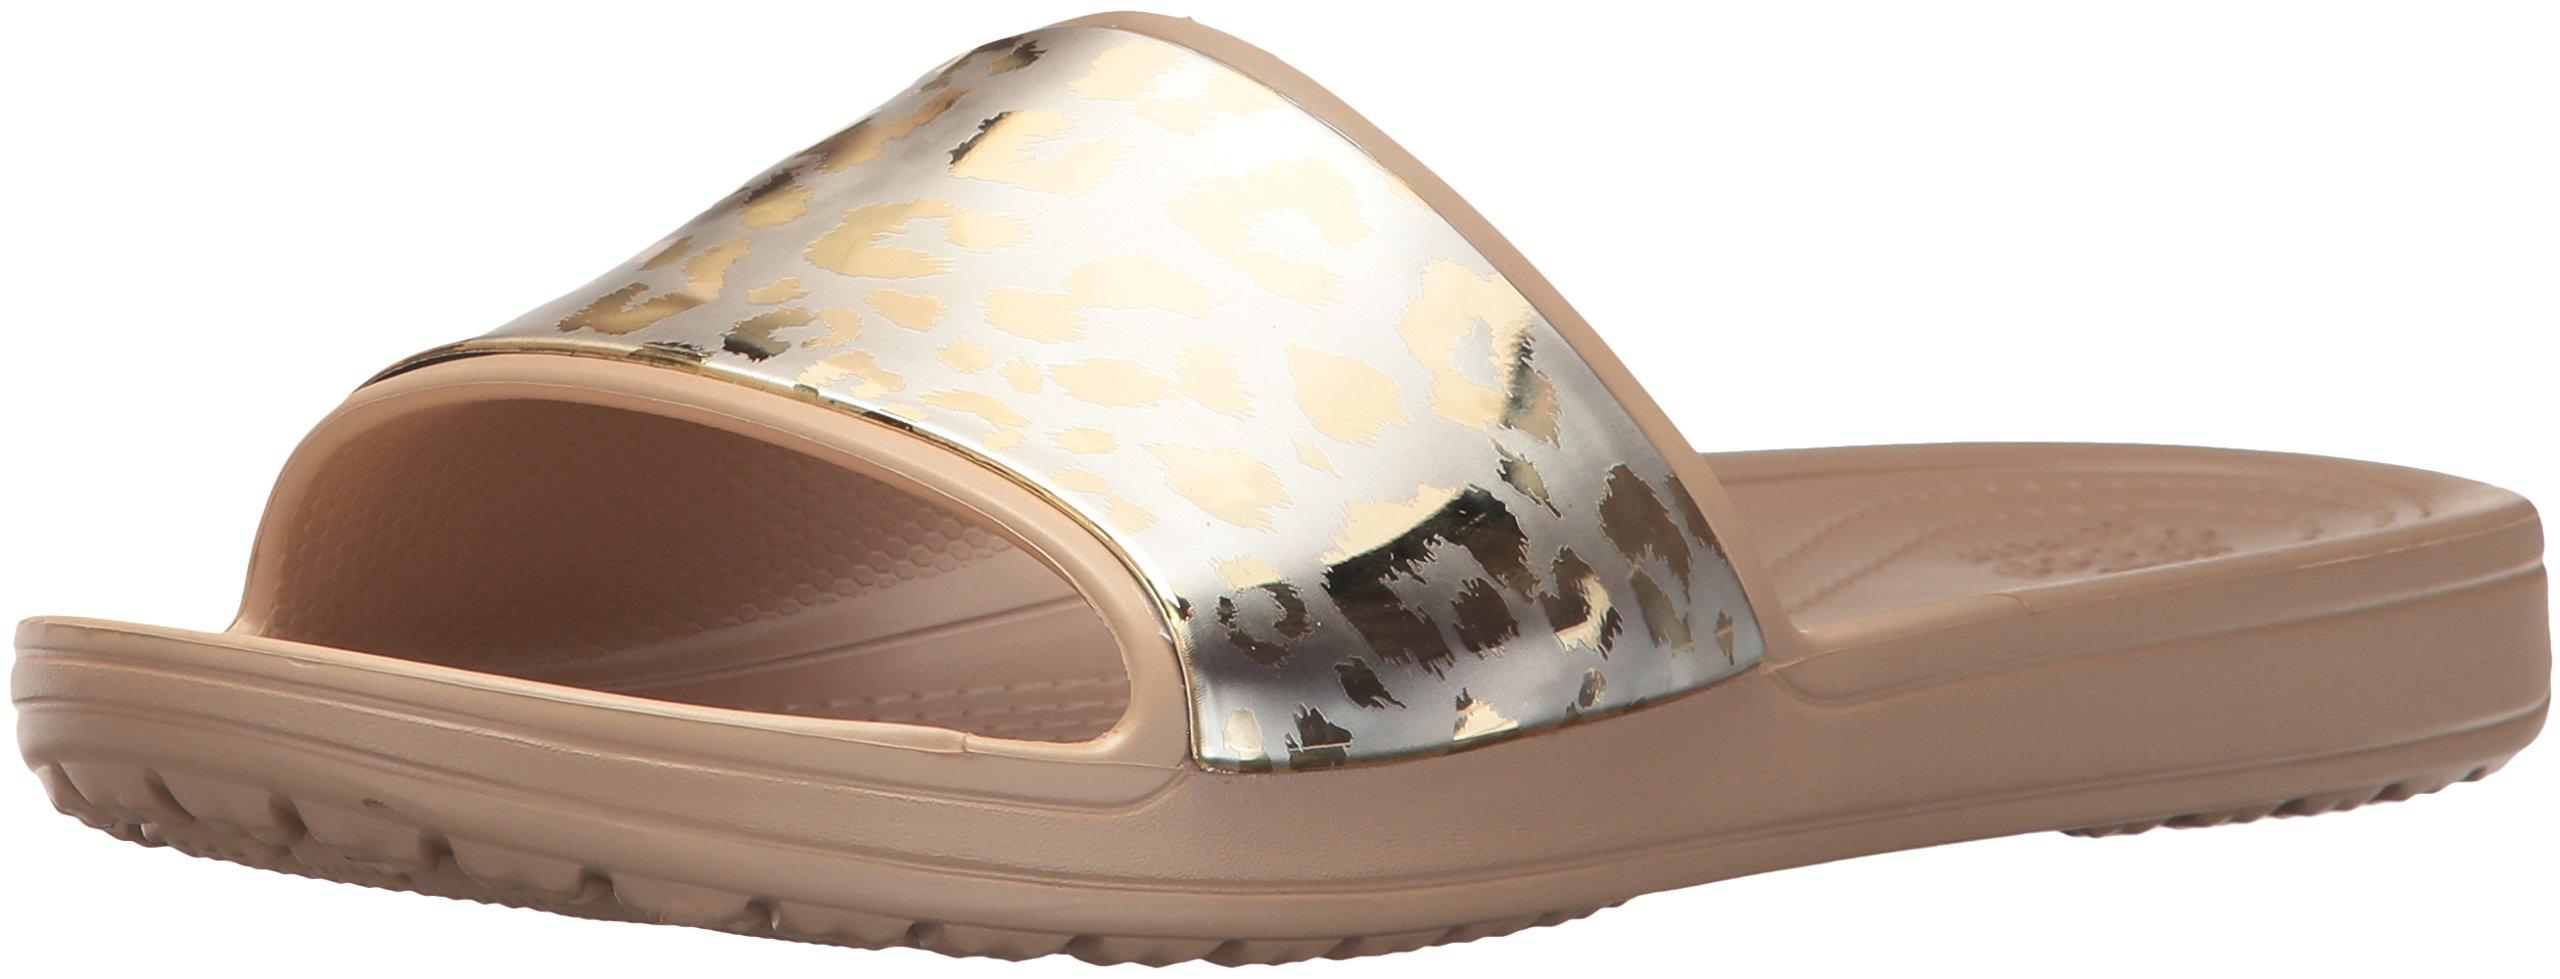 Crocs Women's Sloane GRPH Metallic W Slide Sandal, Gold/Gold, 9 M US